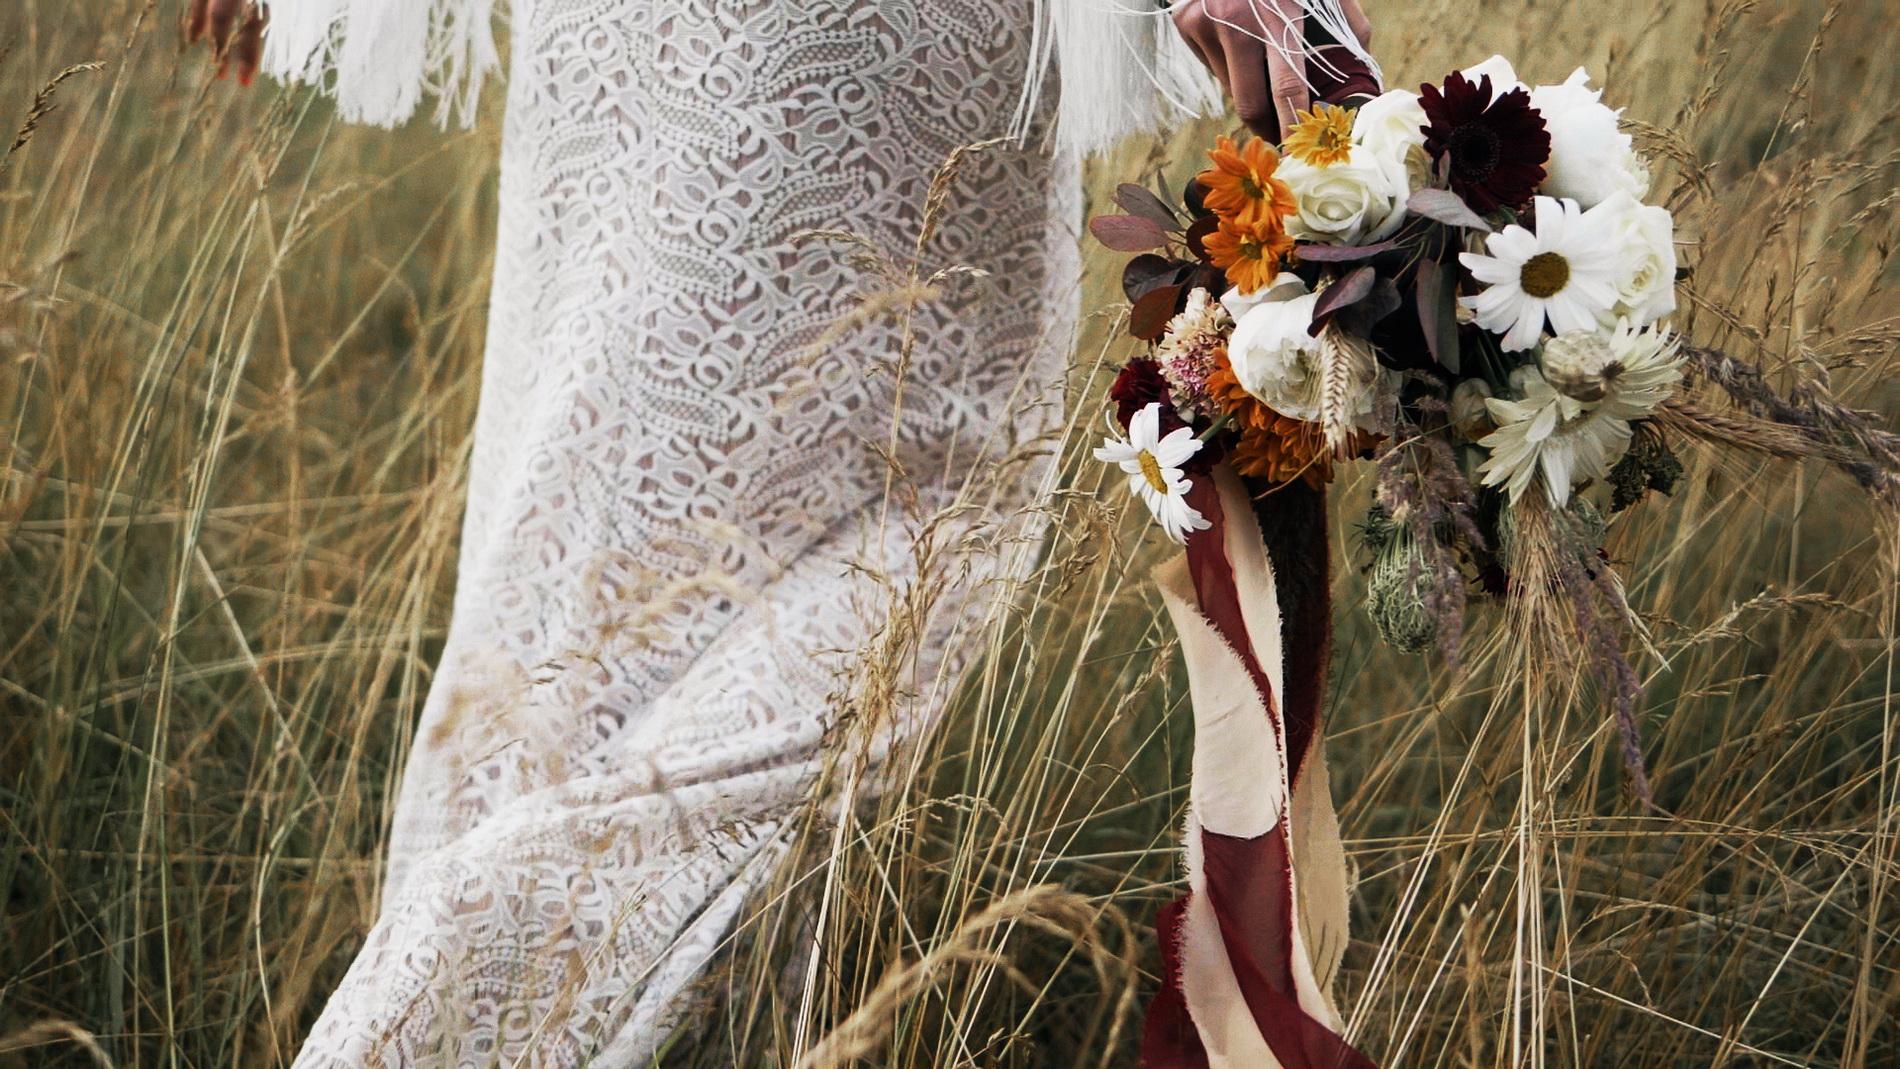 wedding_editorial_art_film_portrait_videographer_sesja_slubna_stylizowana_boho_filmowca_teledysk_slubny 02 (2).jpg